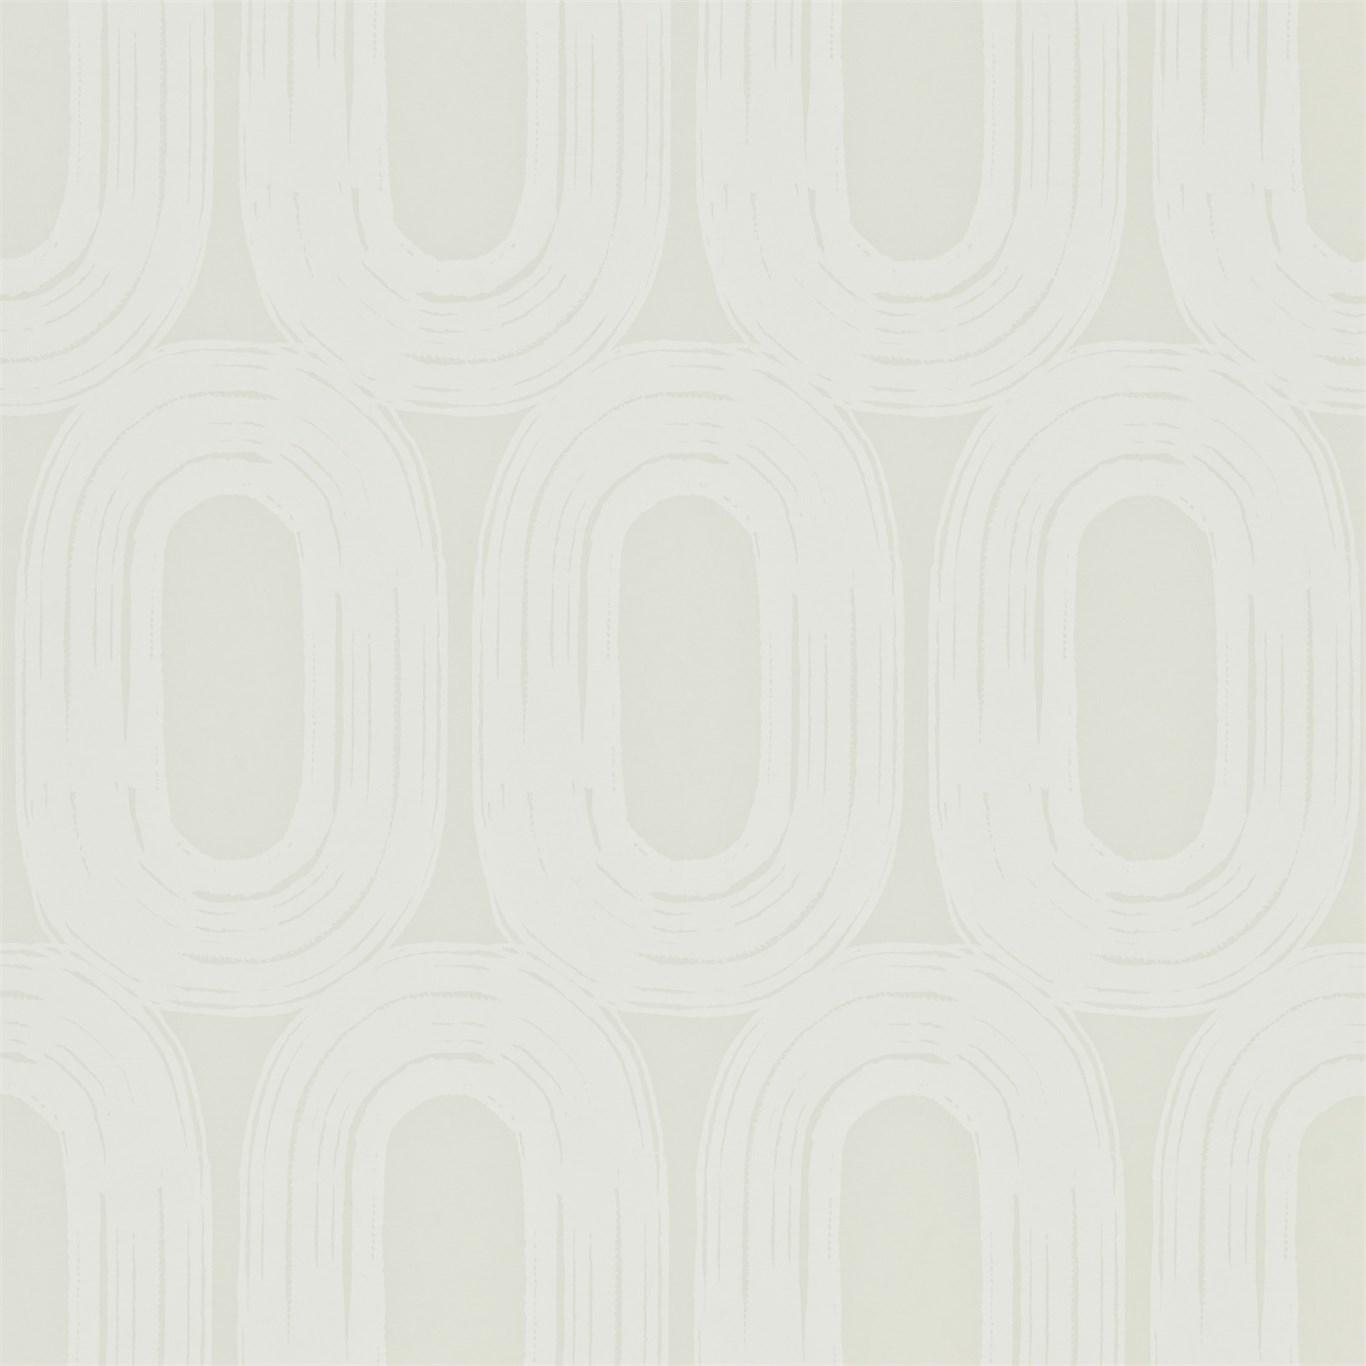 Английские обои Scion,  коллекция Wabi Sabi, артикул110451